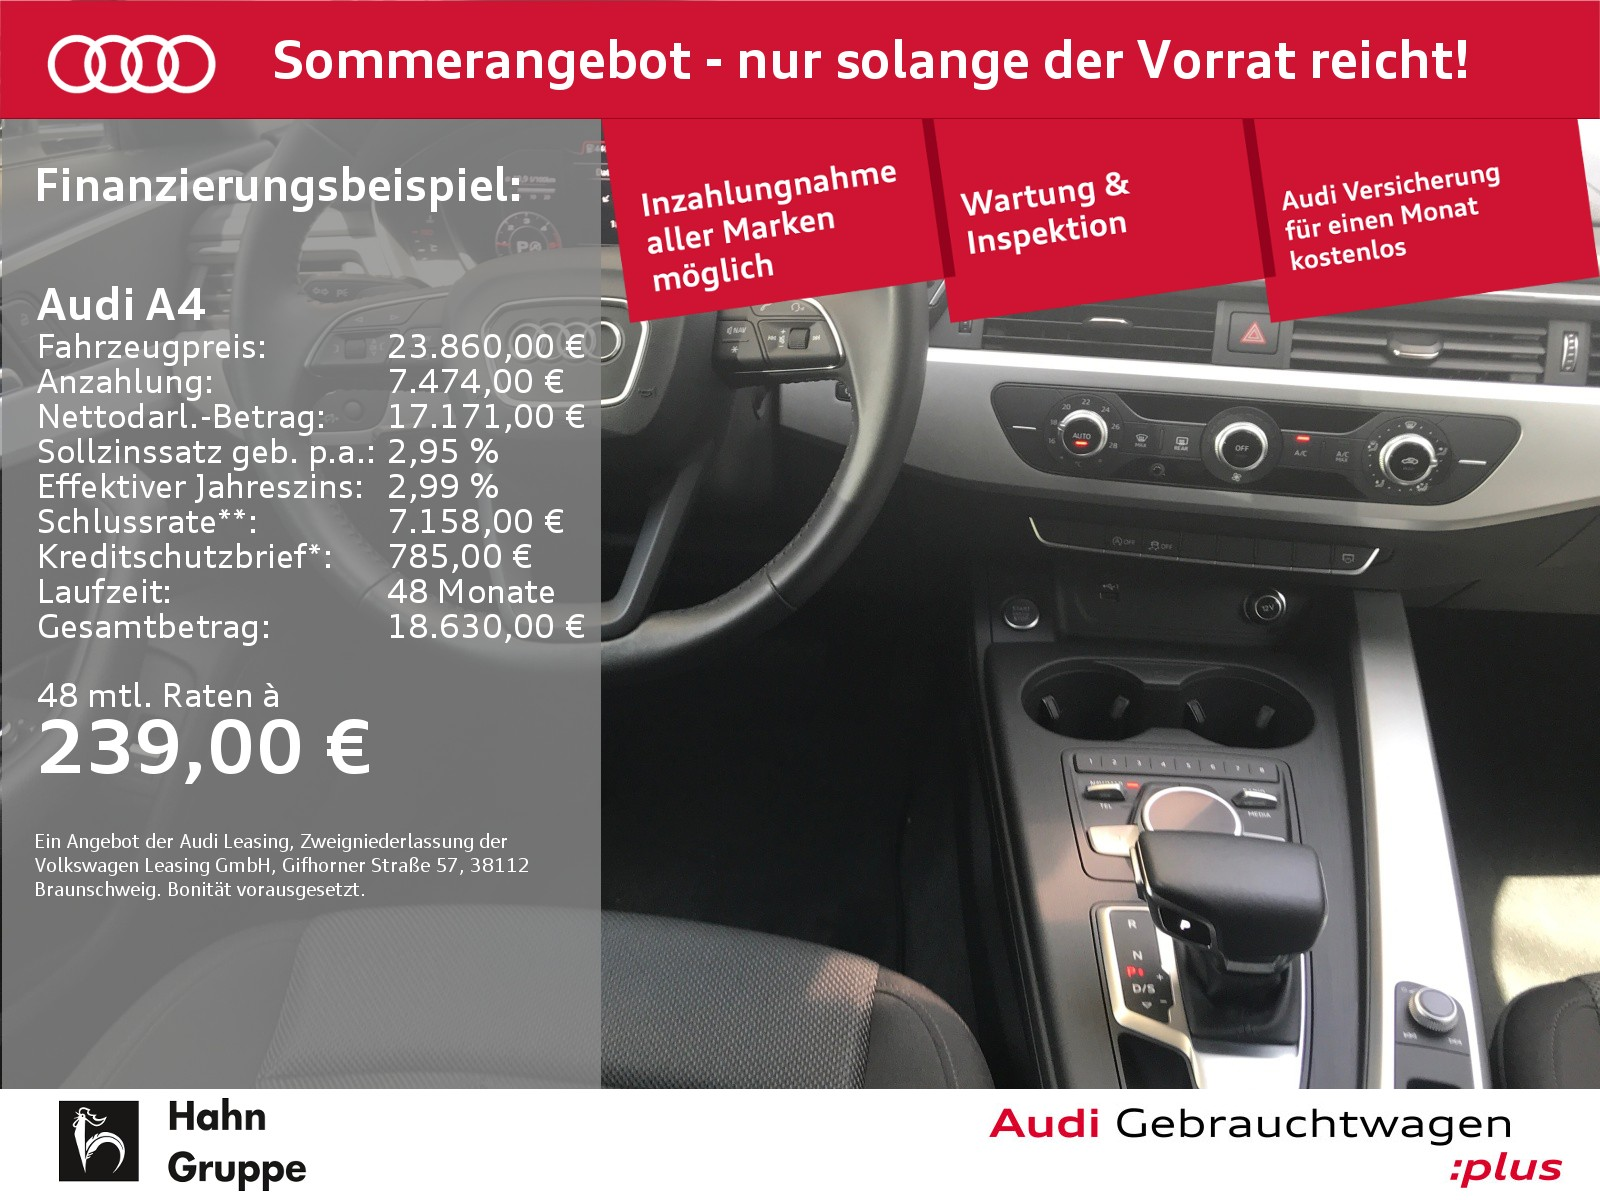 Audi A4 Avant 2.0 TDI S-trc Navi LED Einpark, Jahr 2018, Diesel